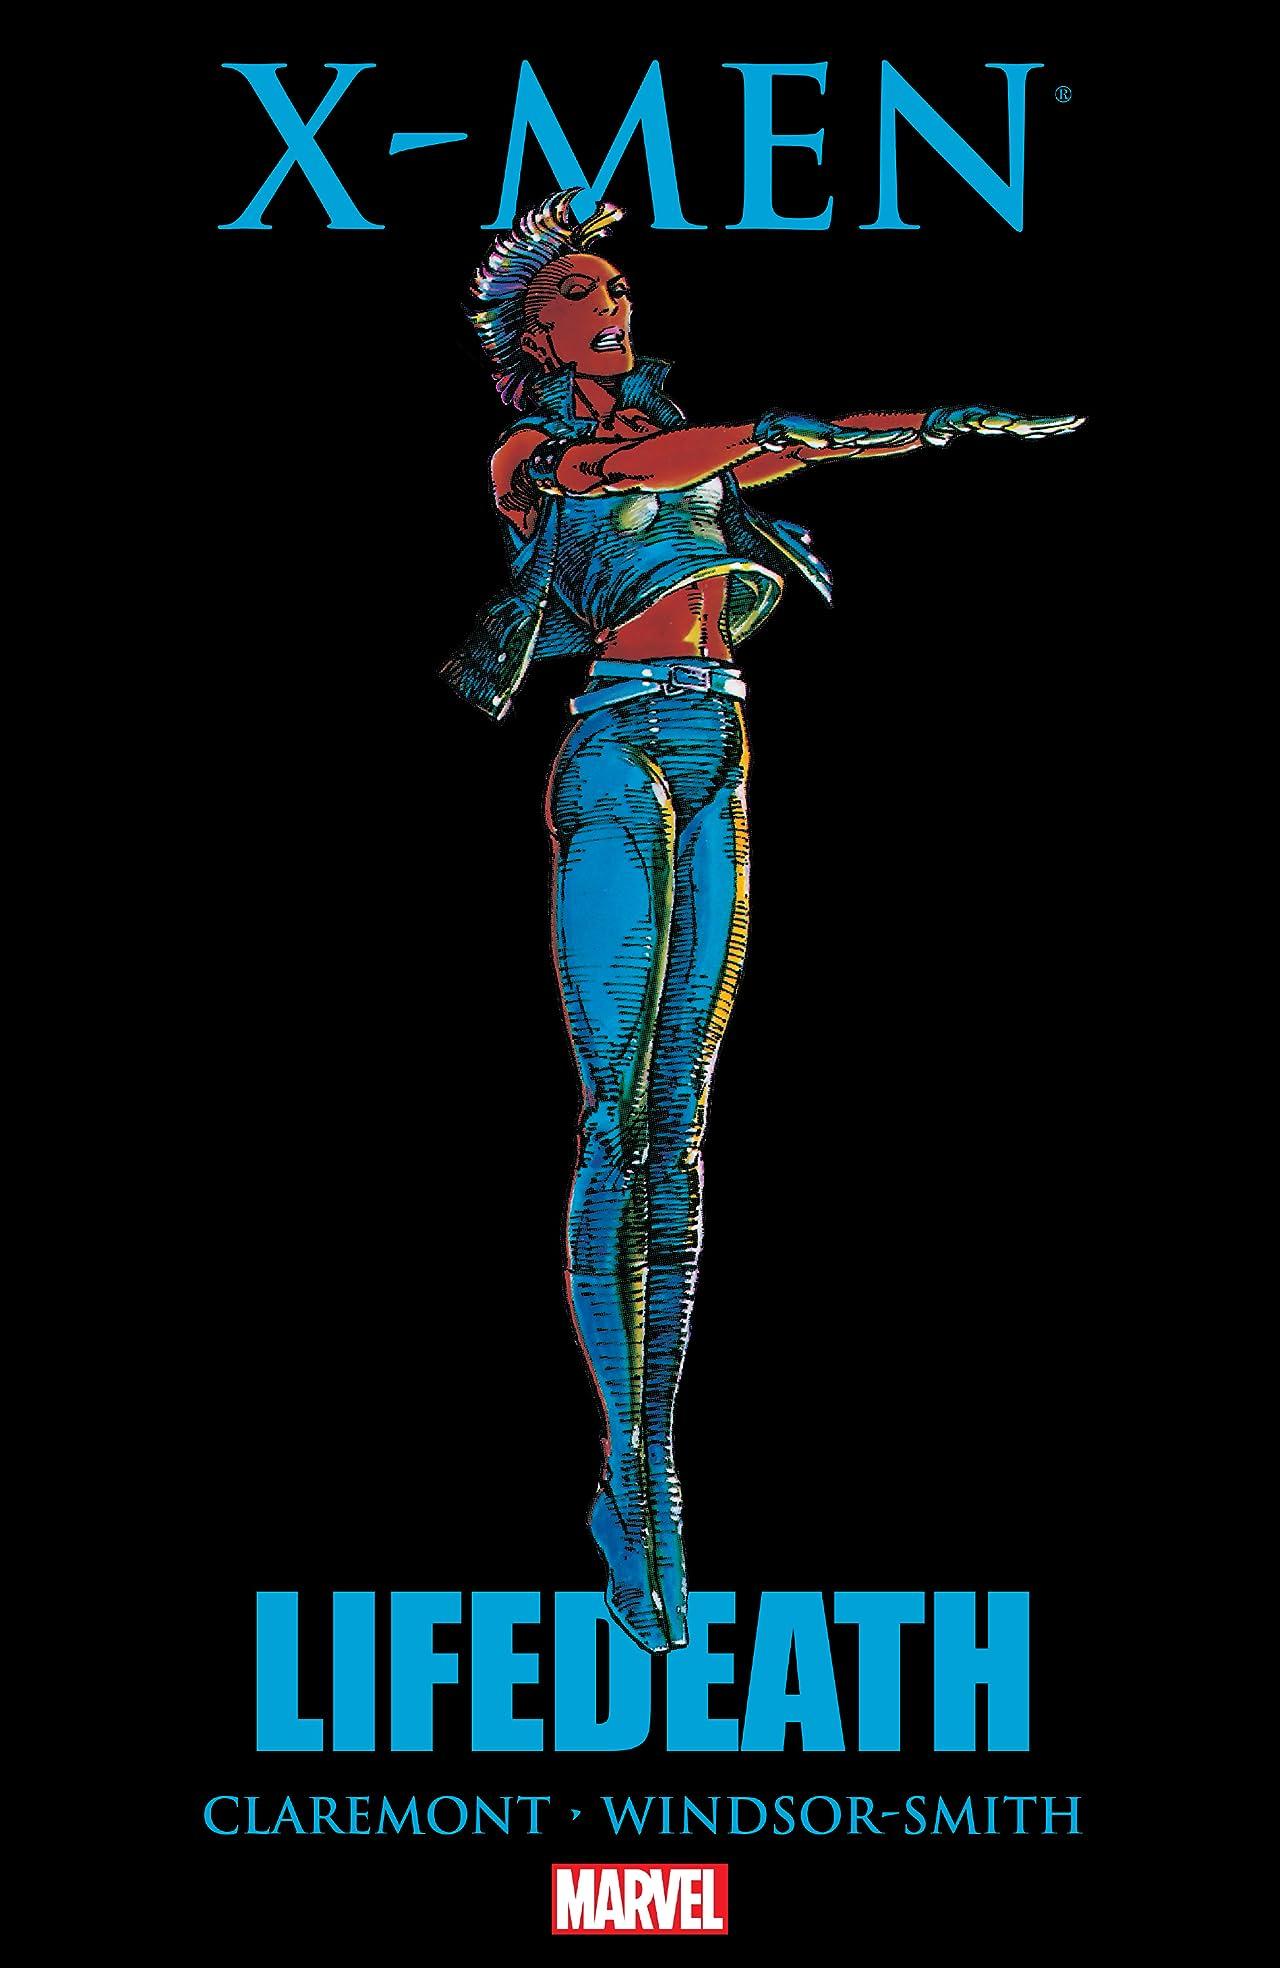 X-Men: Lifedeath